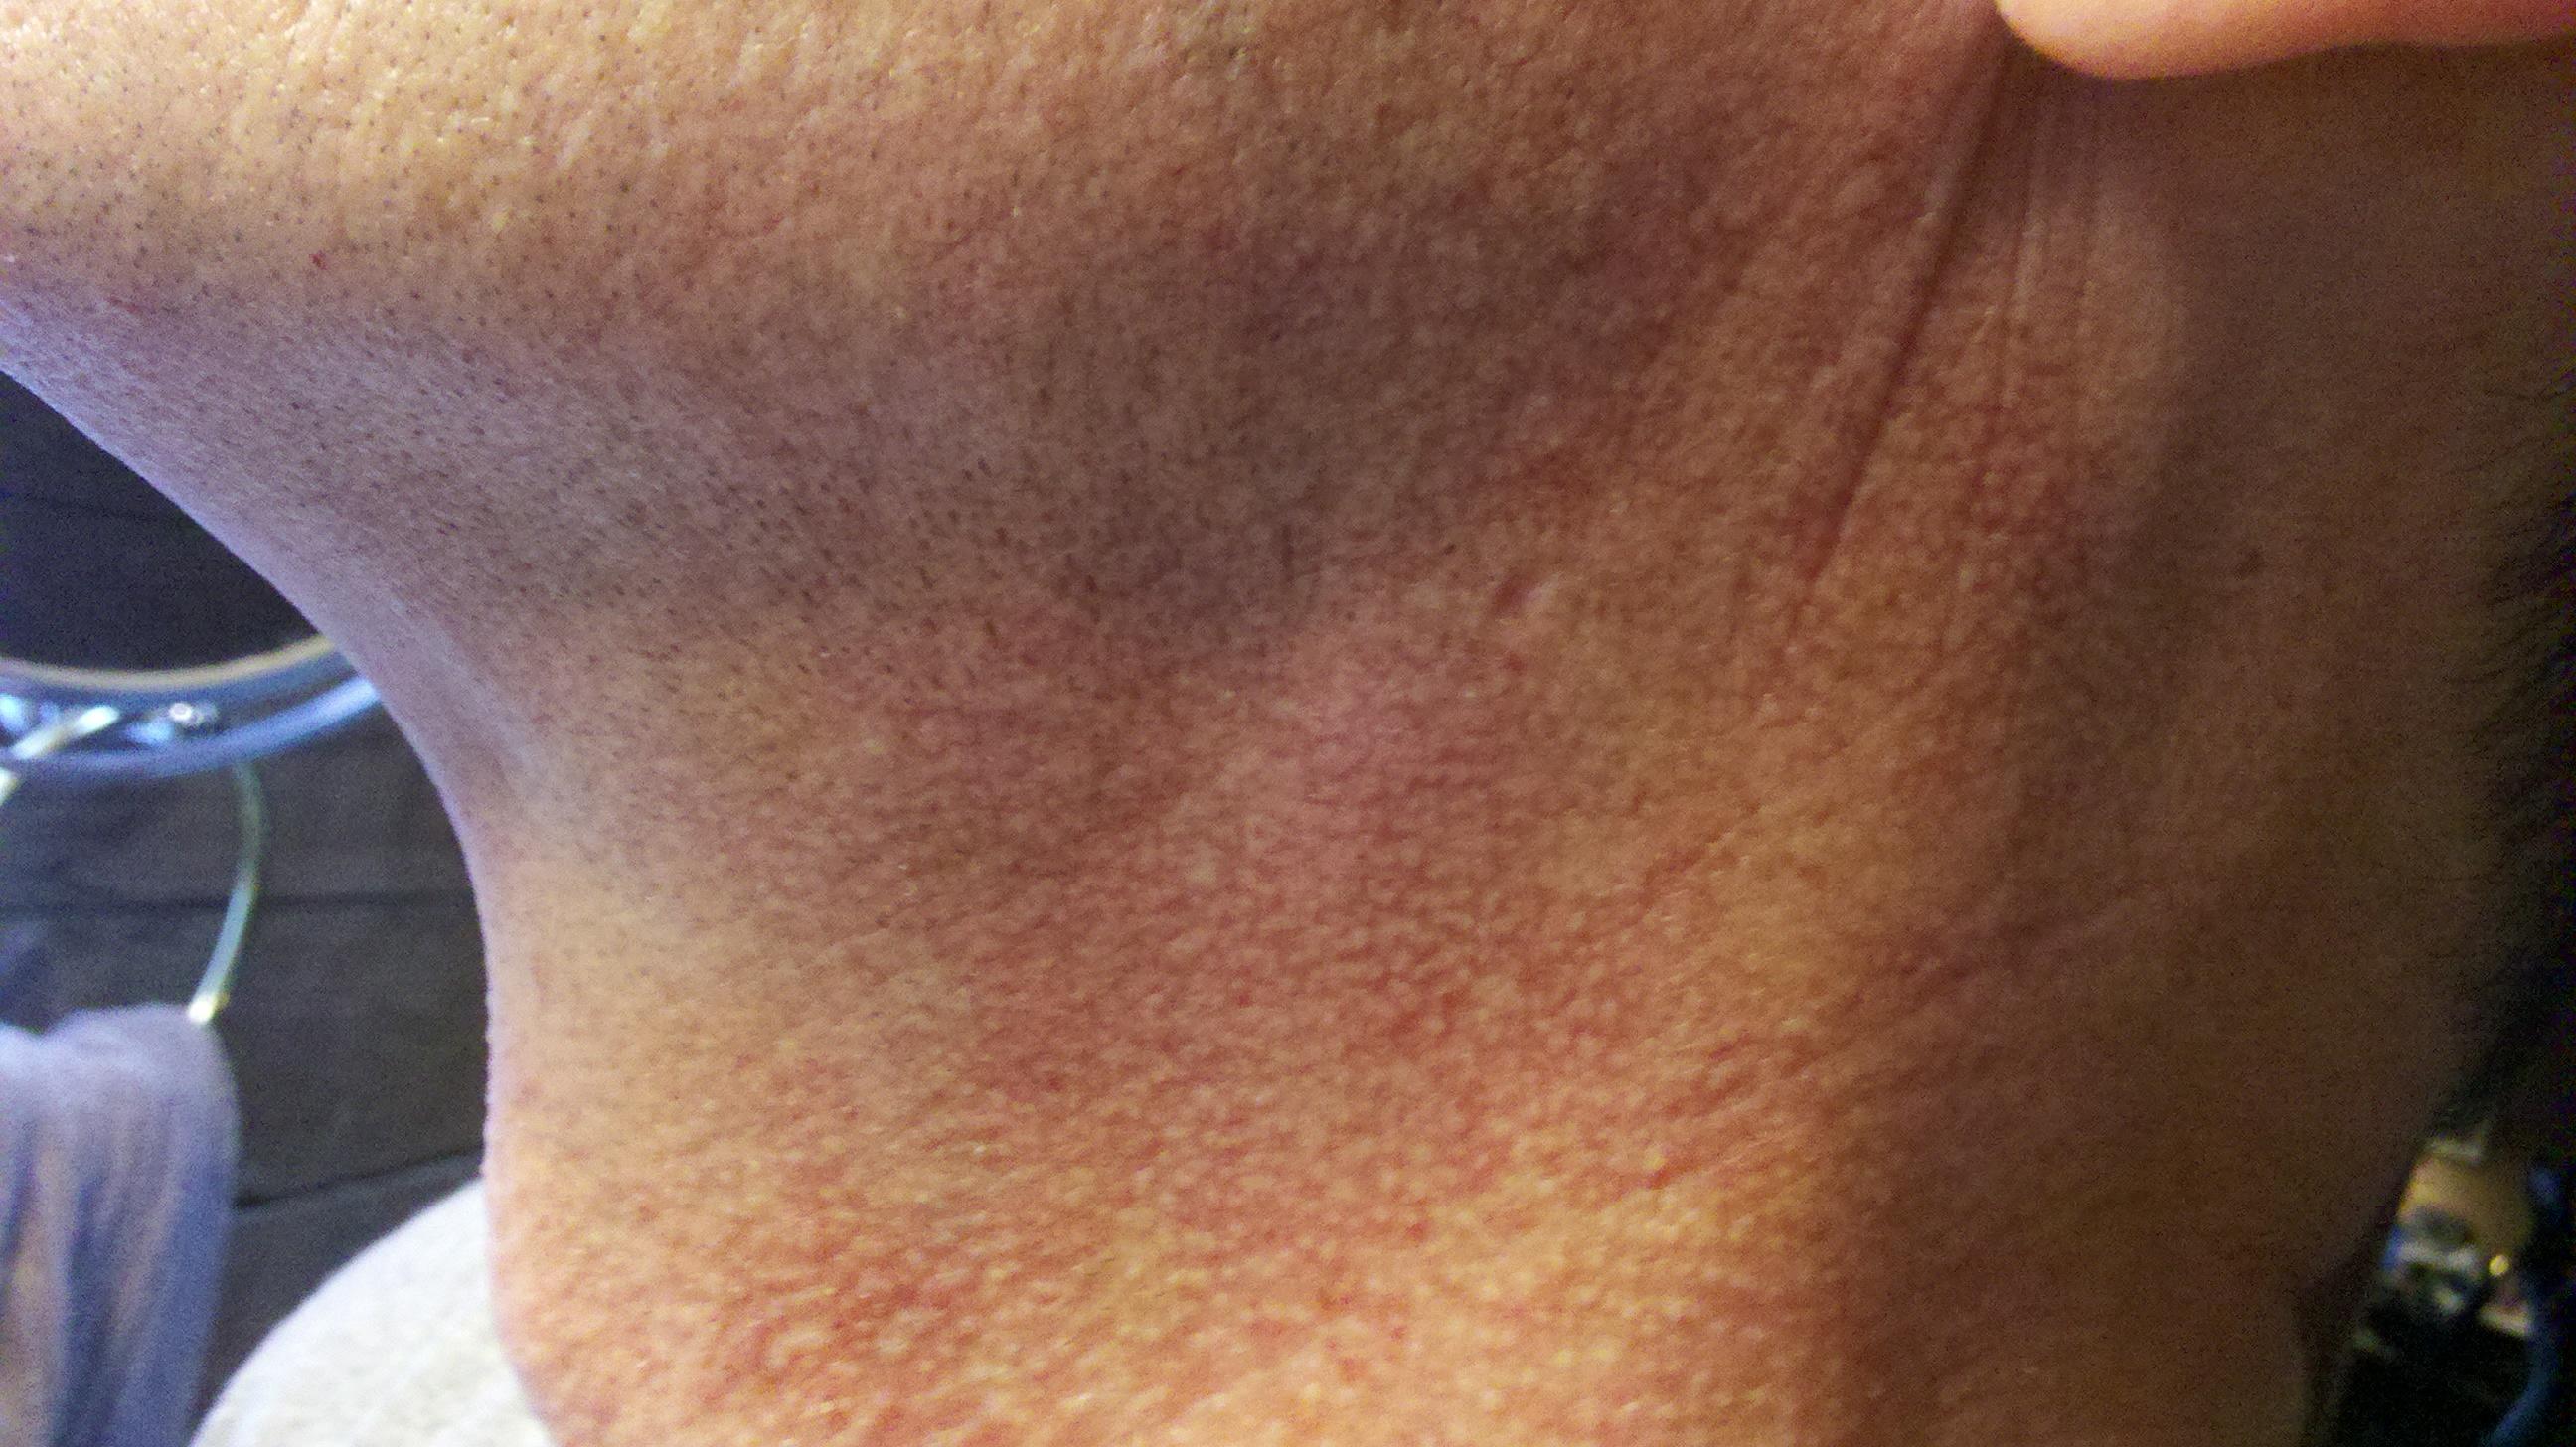 red rash around neck - MedHelp